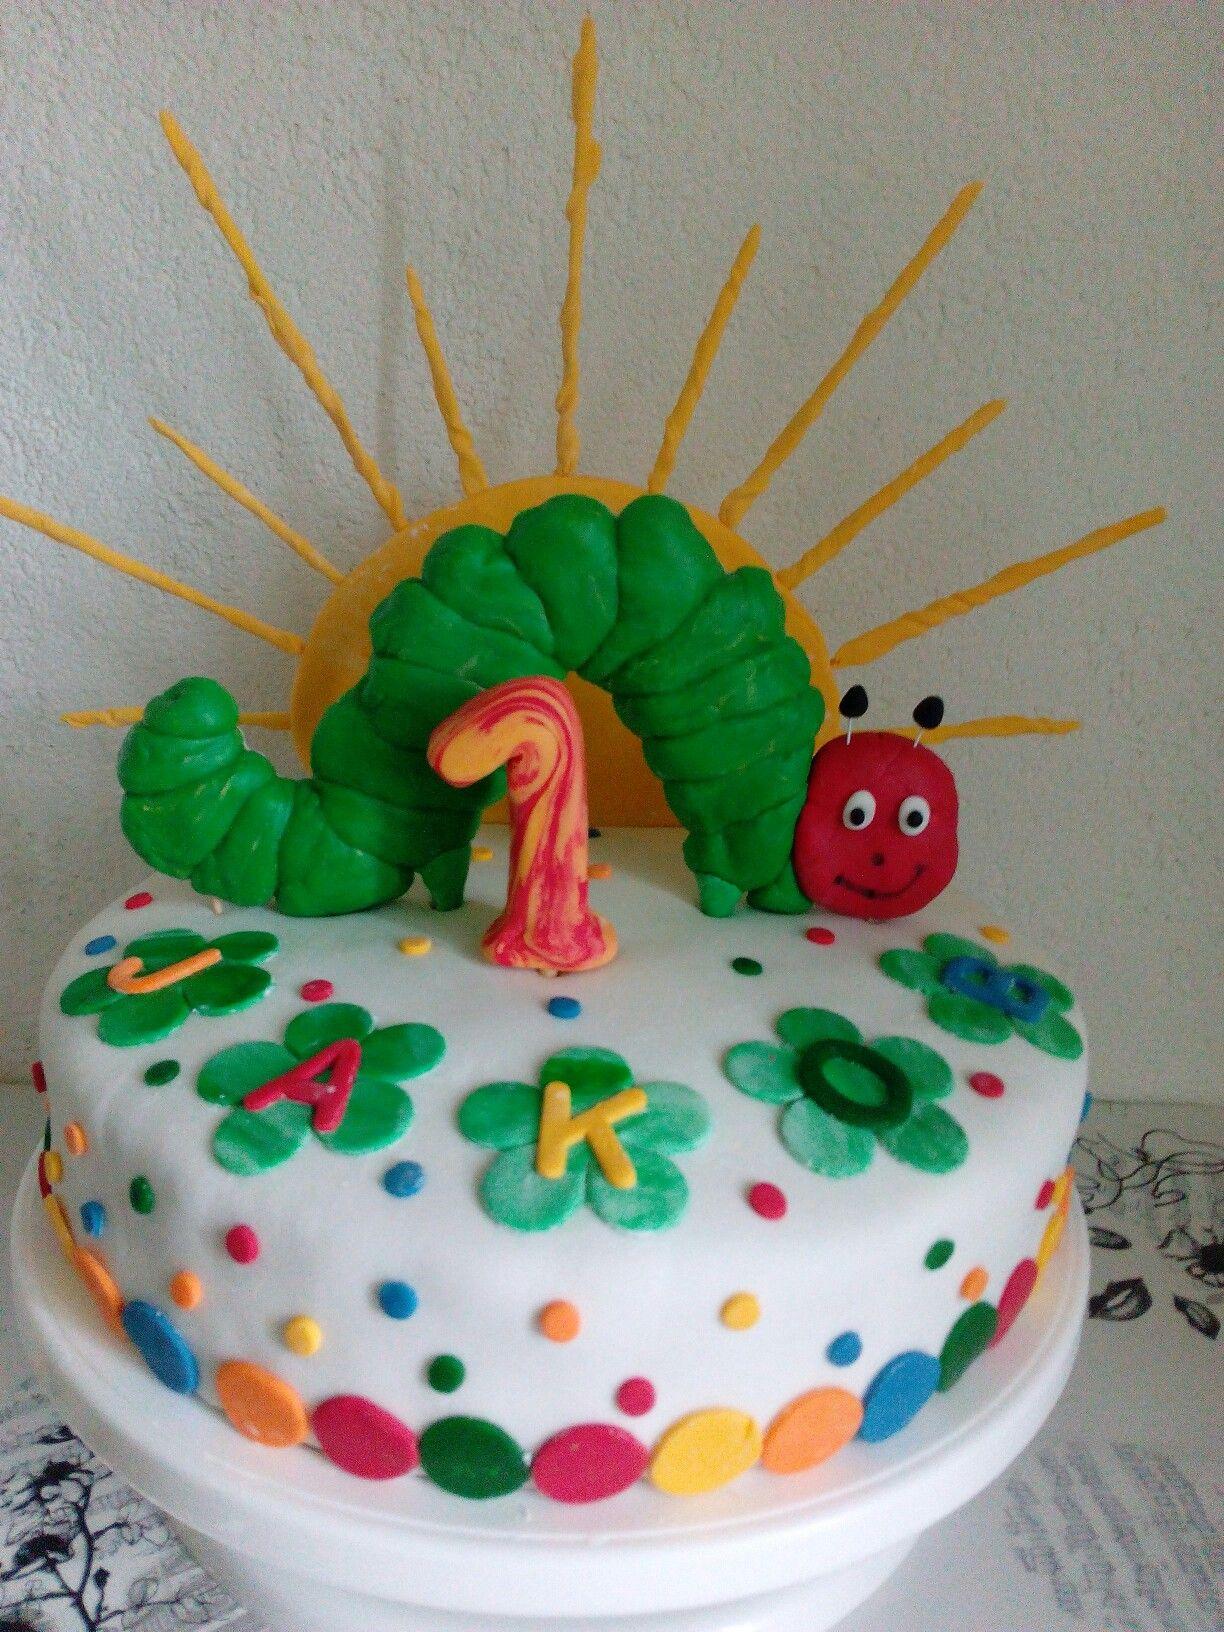 Raupe Nimmersatt Torte Raupe Nimmersatt Torte Raupe Nimmersatt Kuchen Kuchen